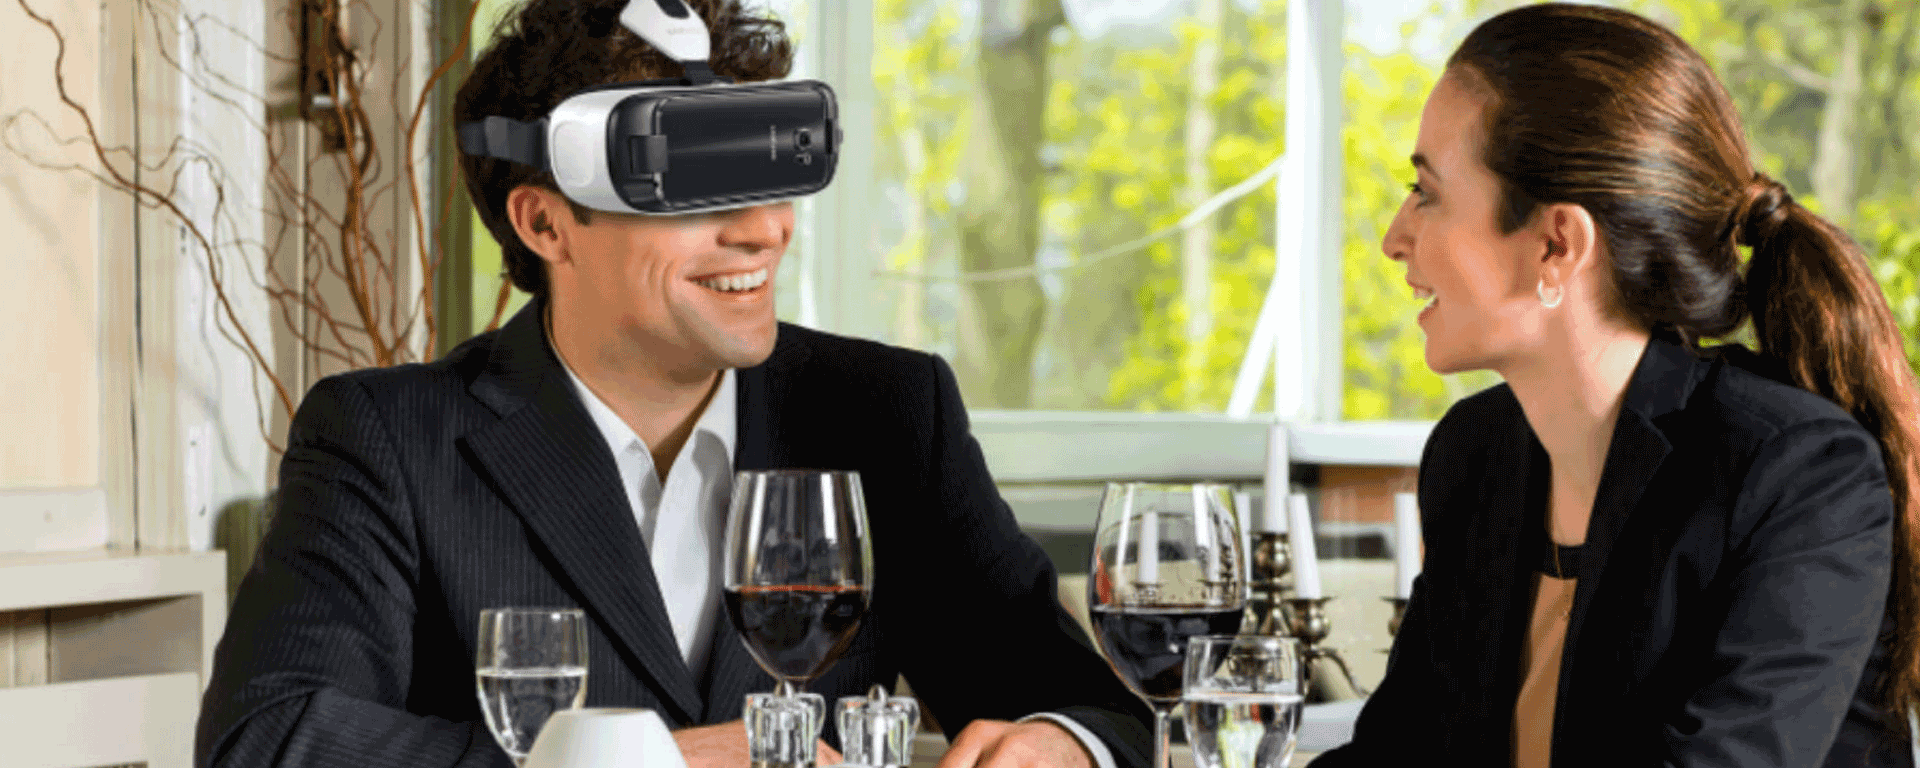 18_USING-SAMSUNG-GEAR-VR-TO-REVOLUTIONIZE-THE-RESTAURANT-EXPERIENCE